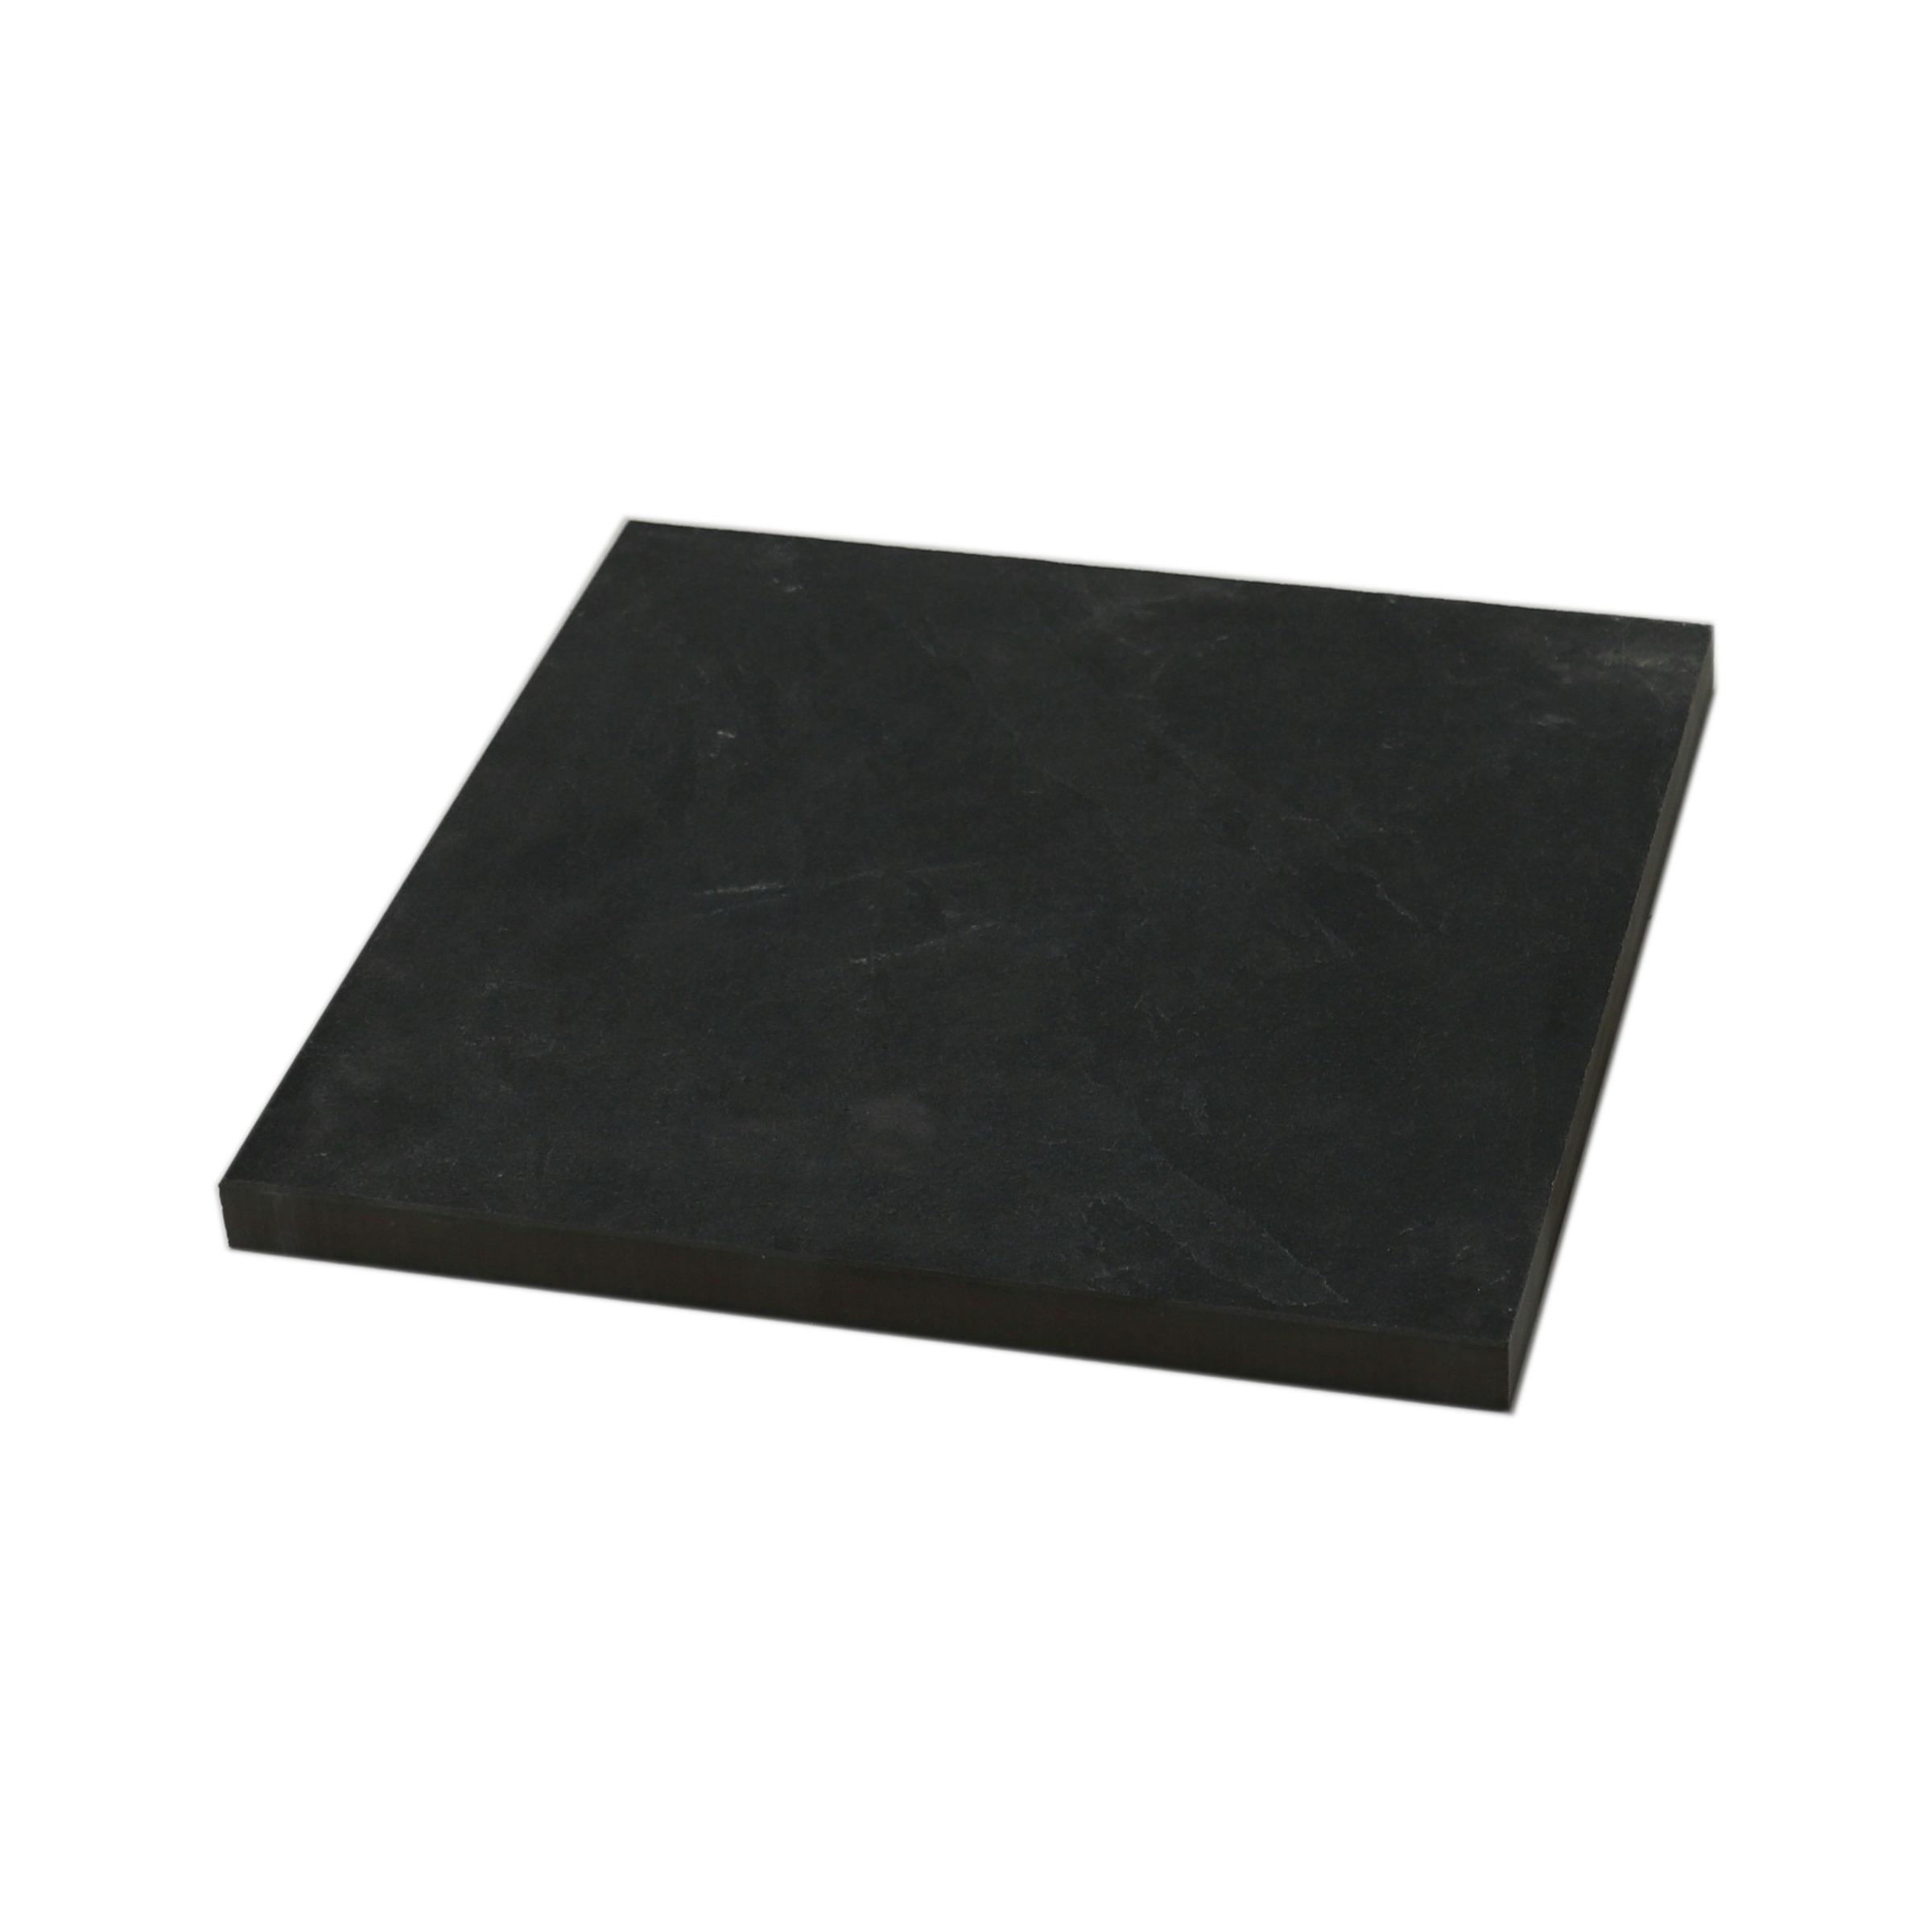 Terrastegel Keramisch Slate Zwart 60x60 cm - 68 Tegels - 24,48 m2